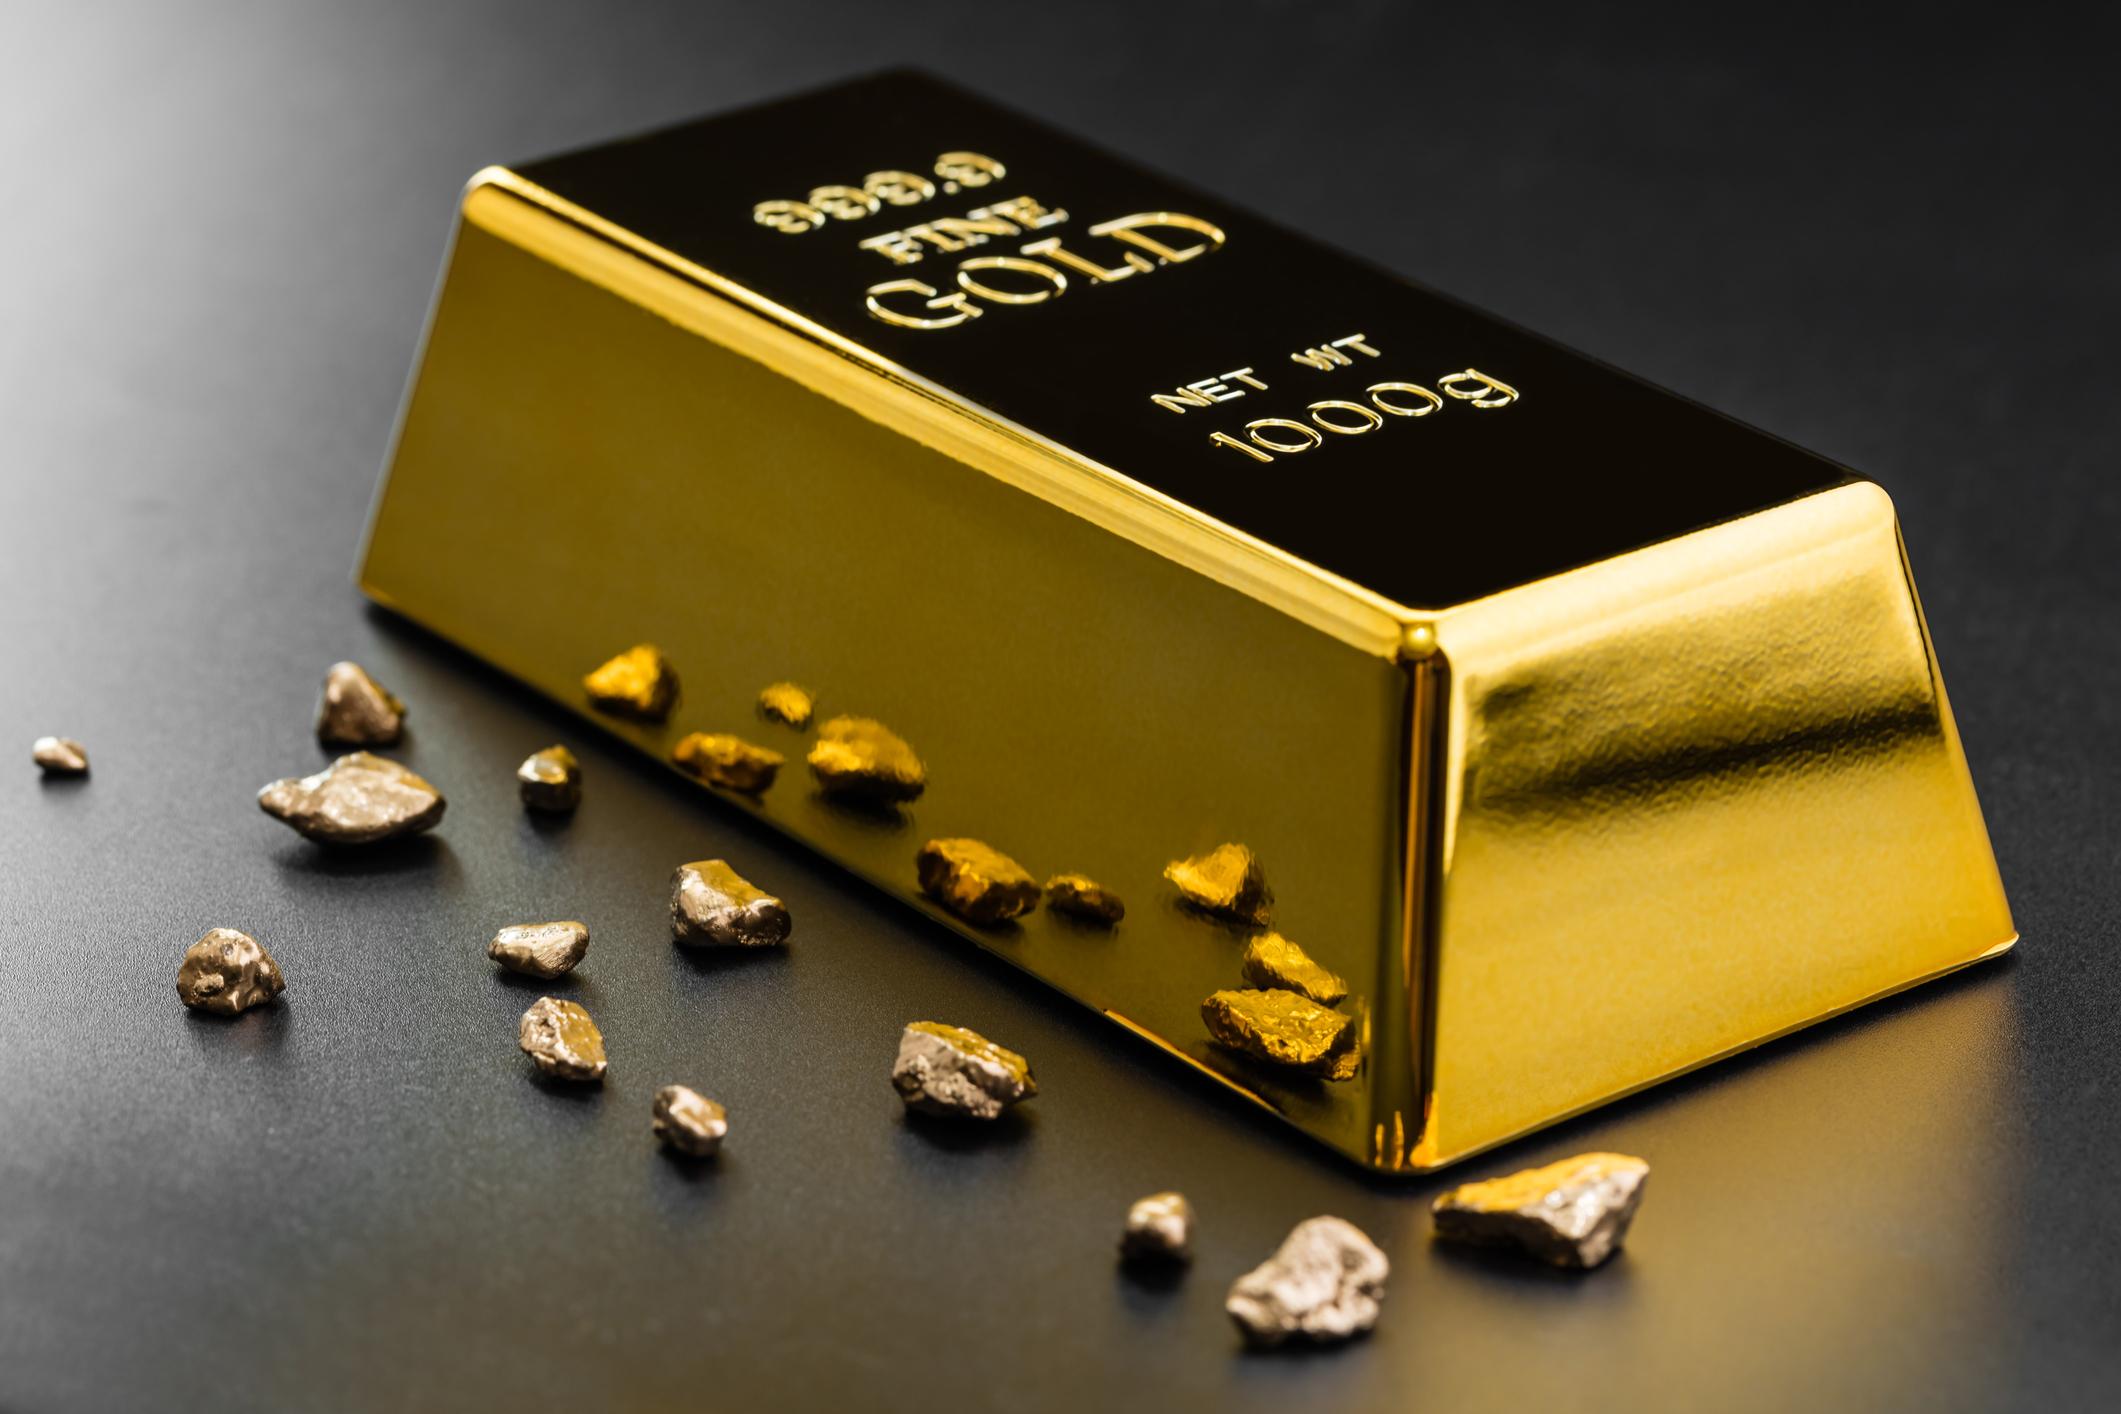 A gold bar on a dark background.